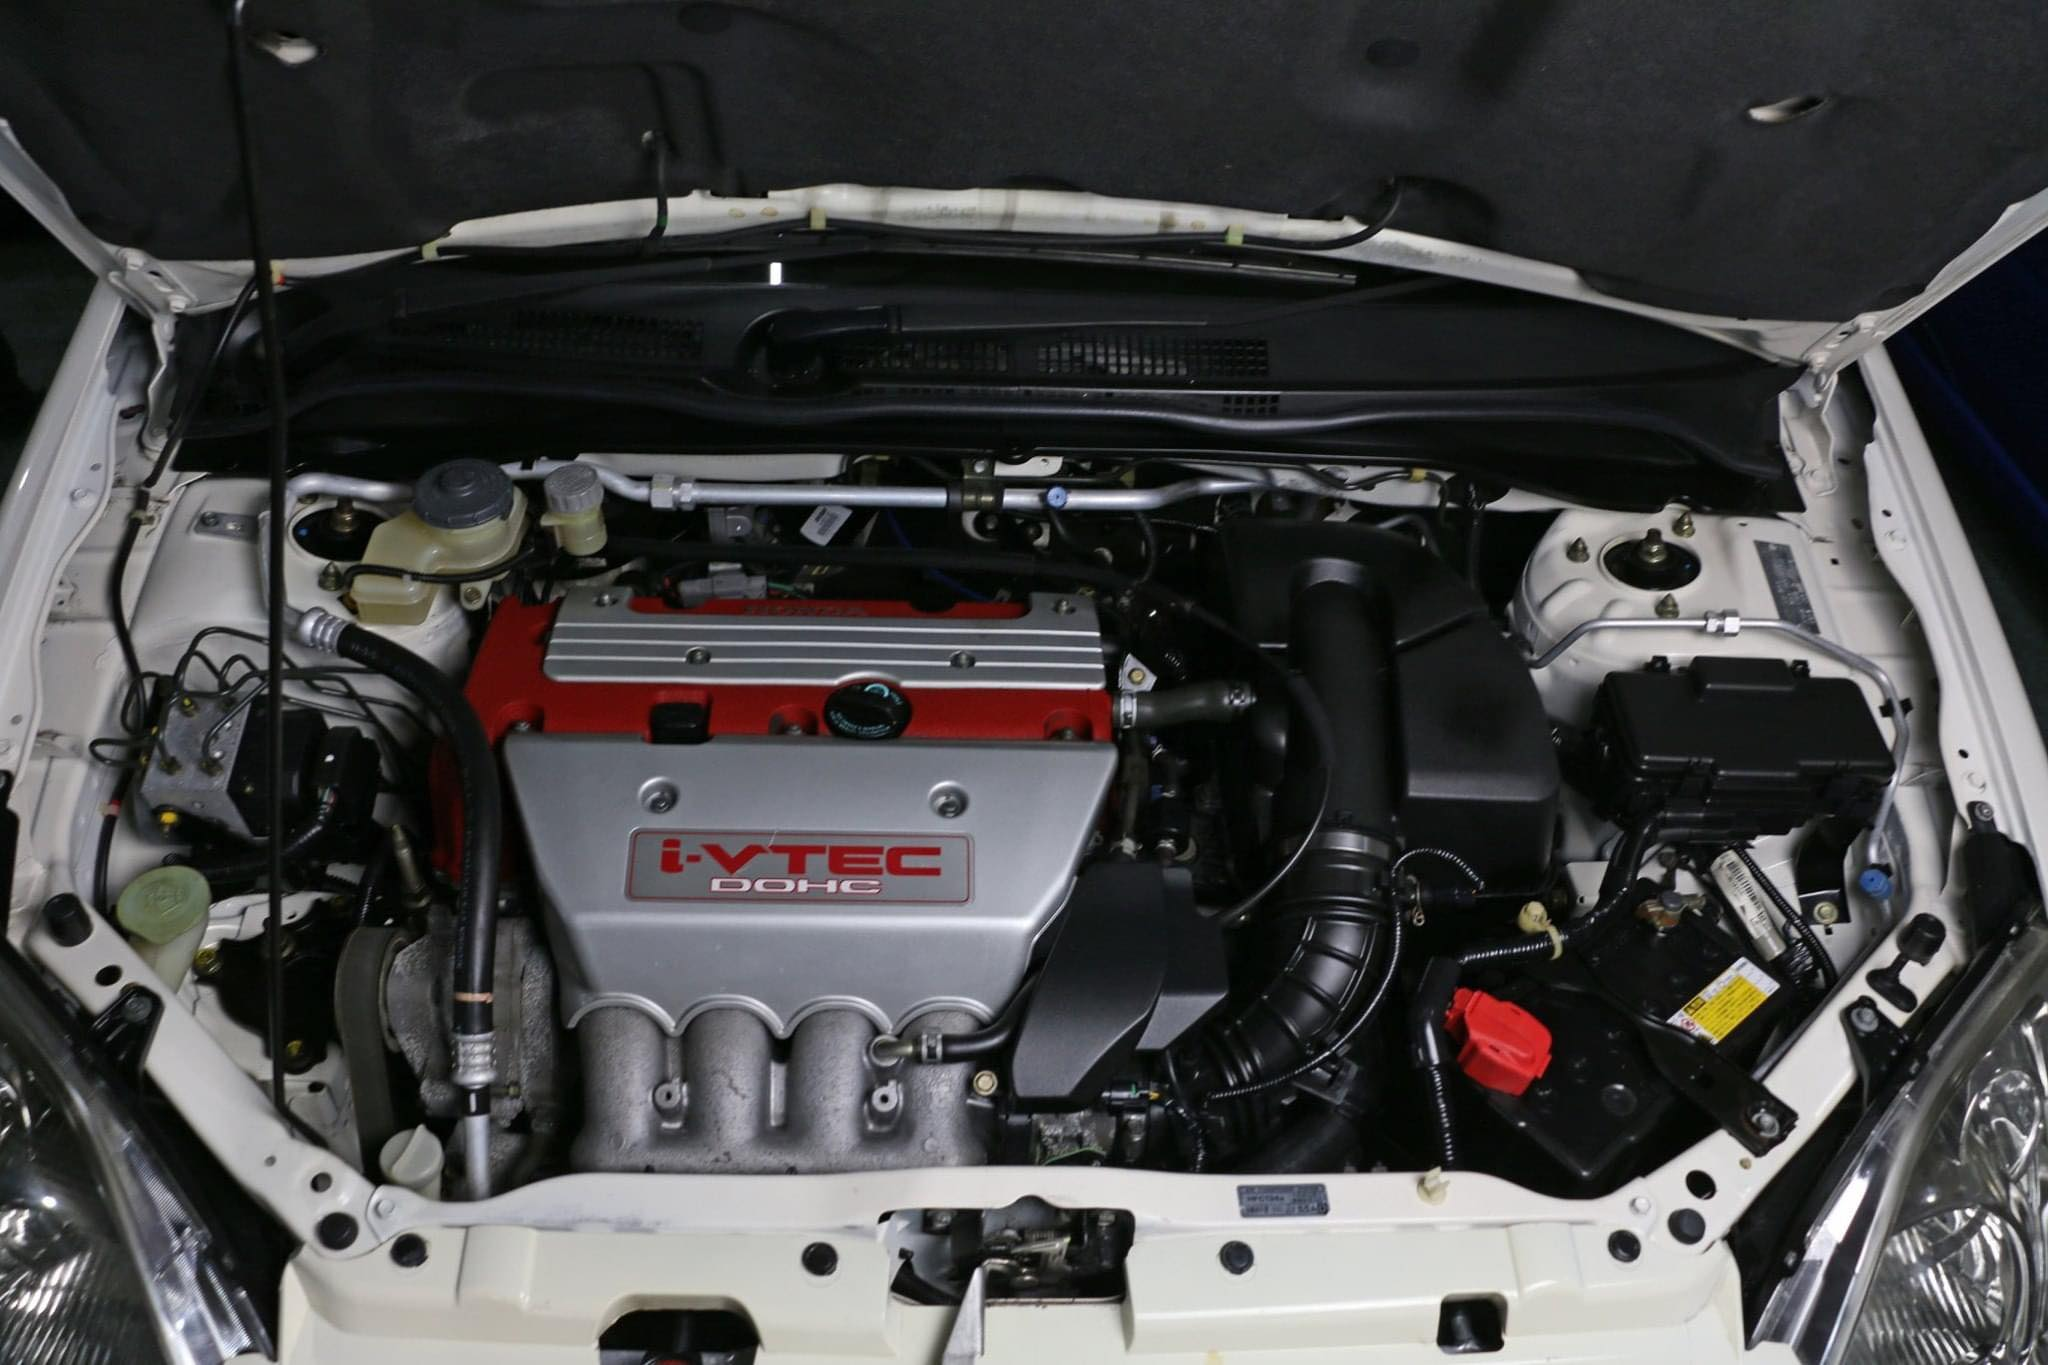 Mikes Racecar